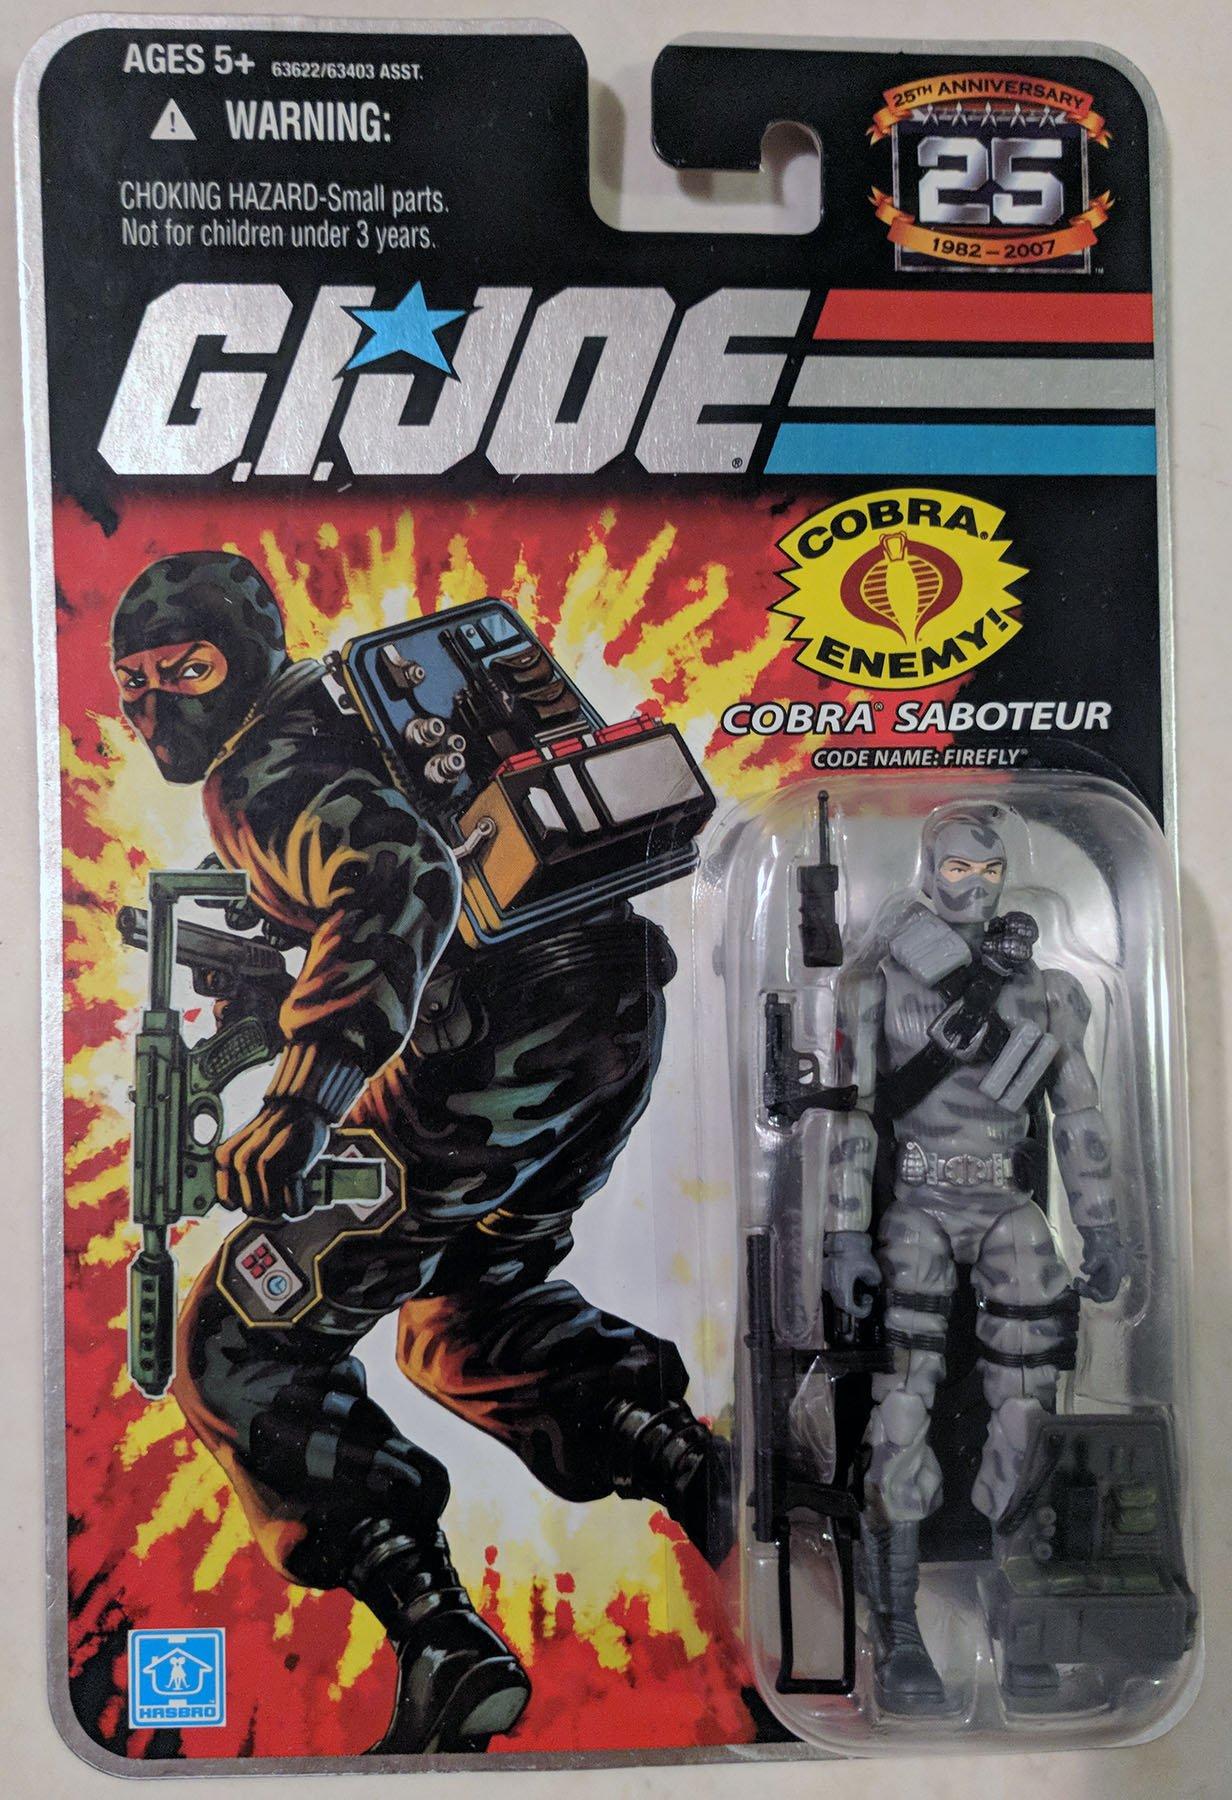 Gi Joe Cobra Saboteur Firefly